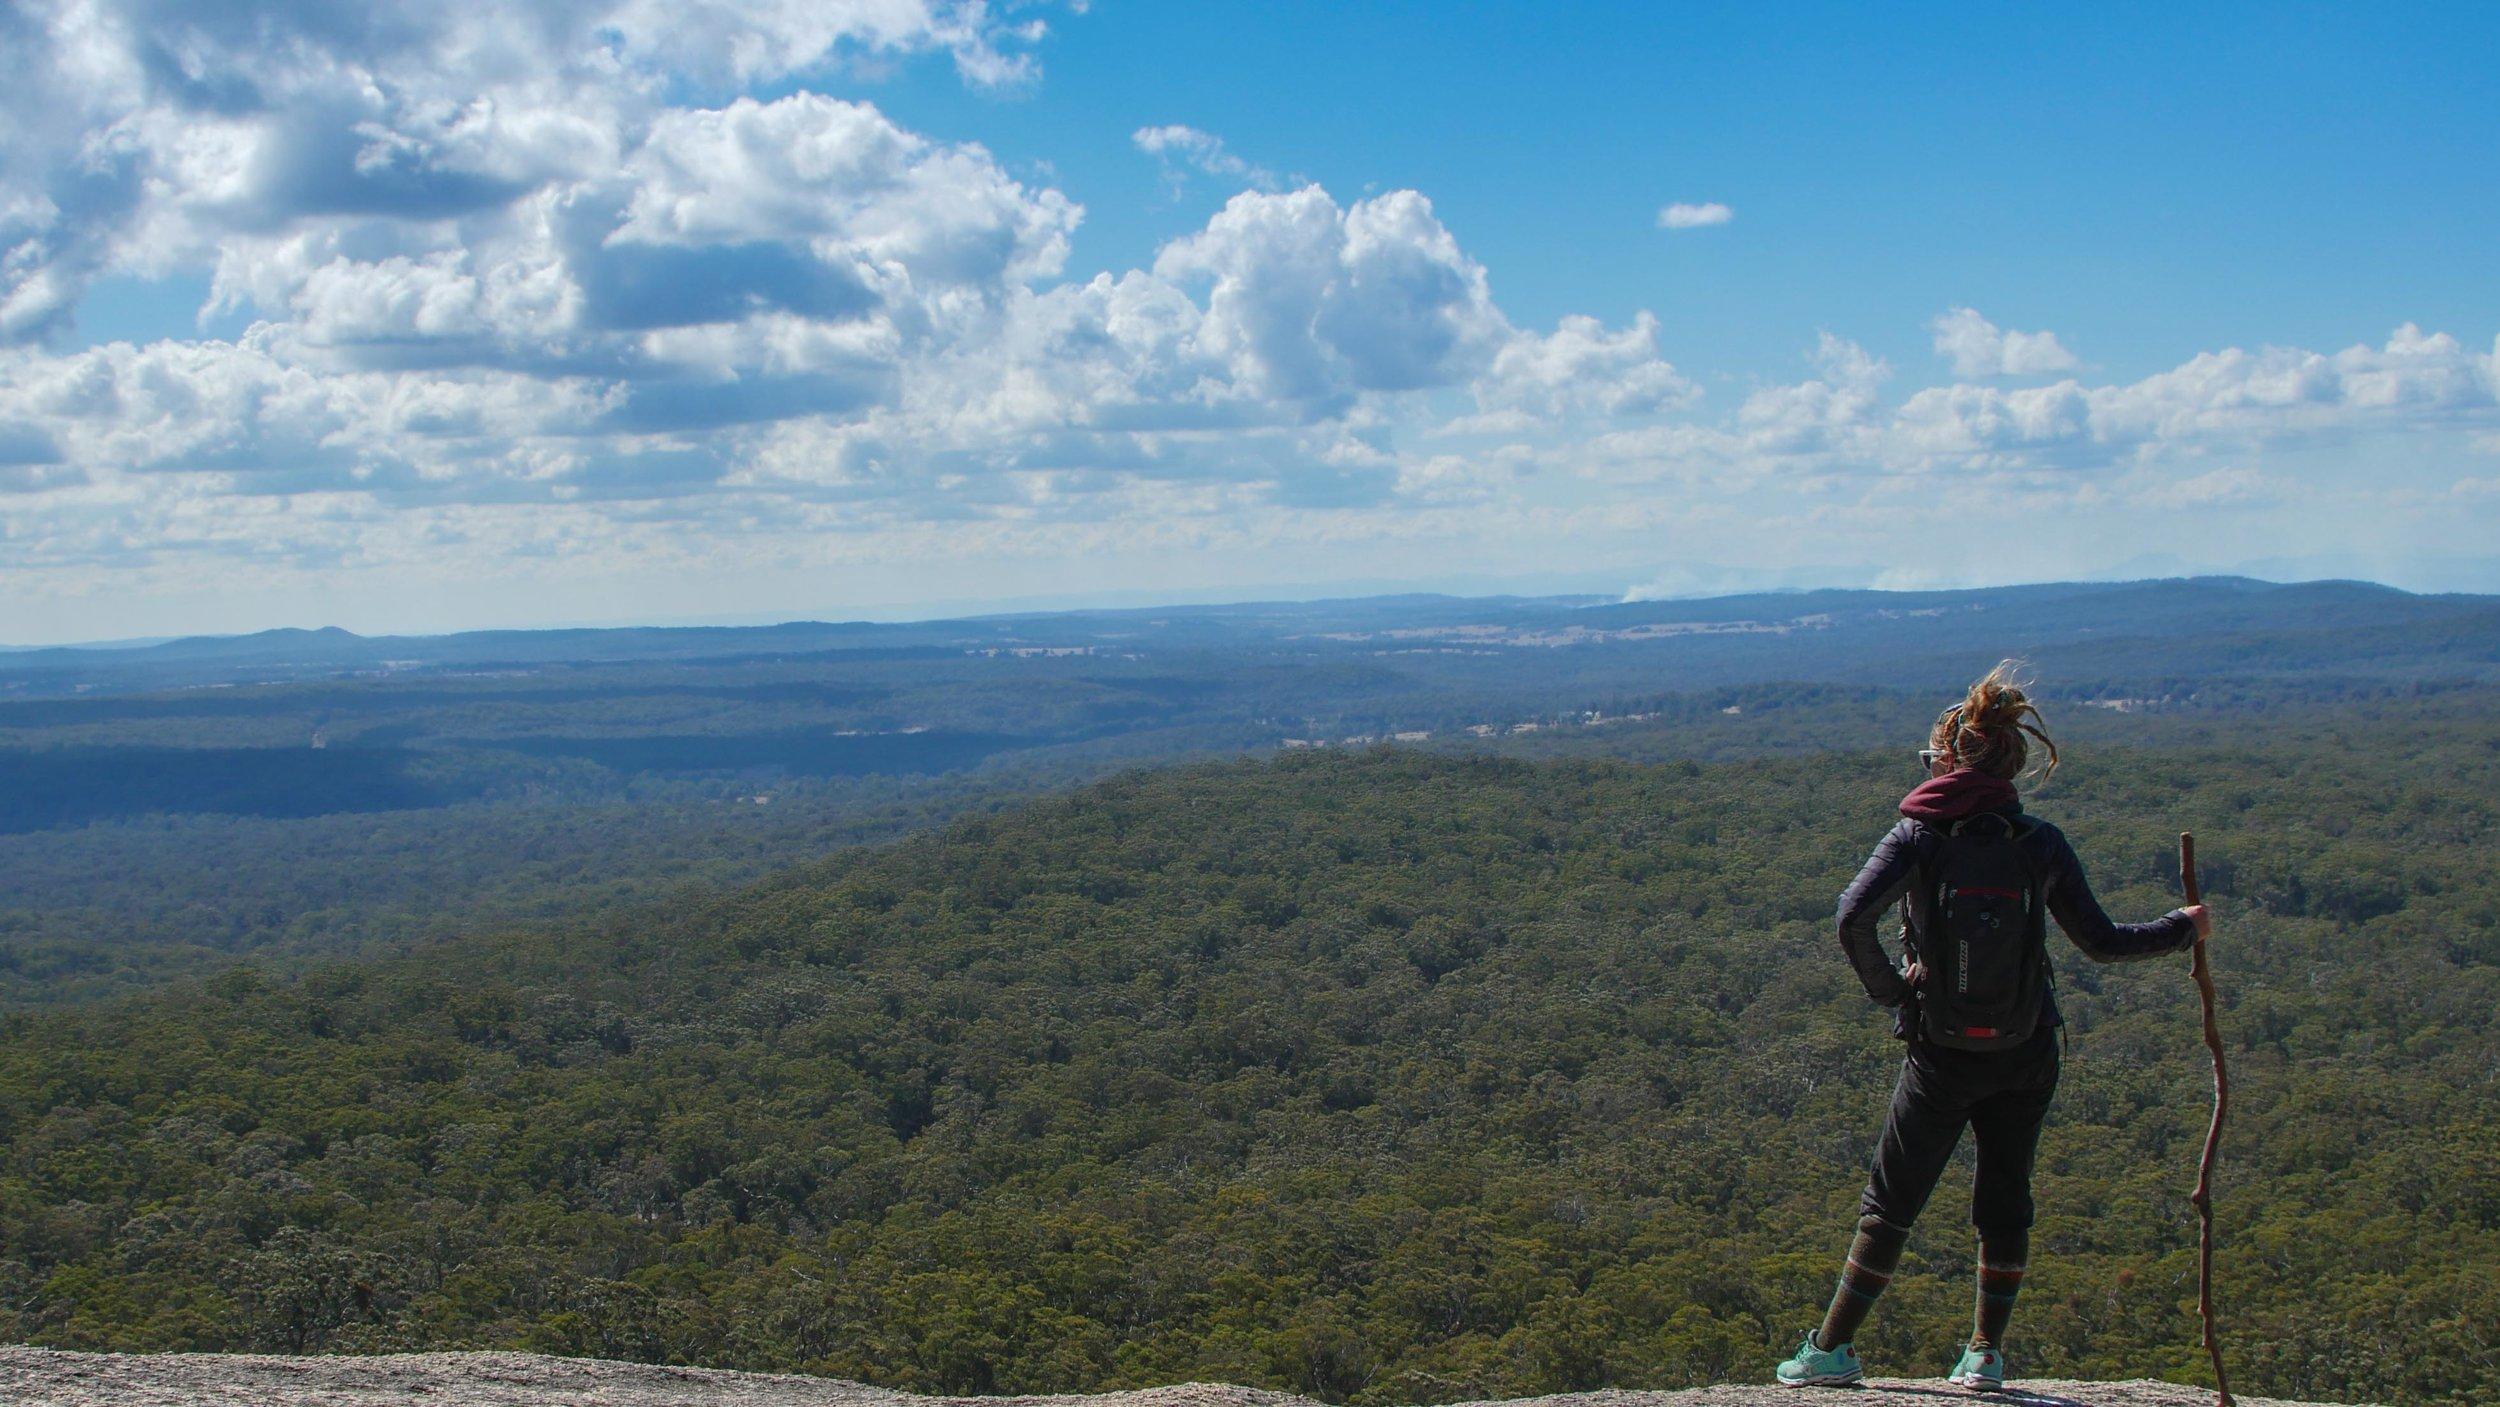 Girraween Bald Rock National Park Australia (3 of 5).jpg